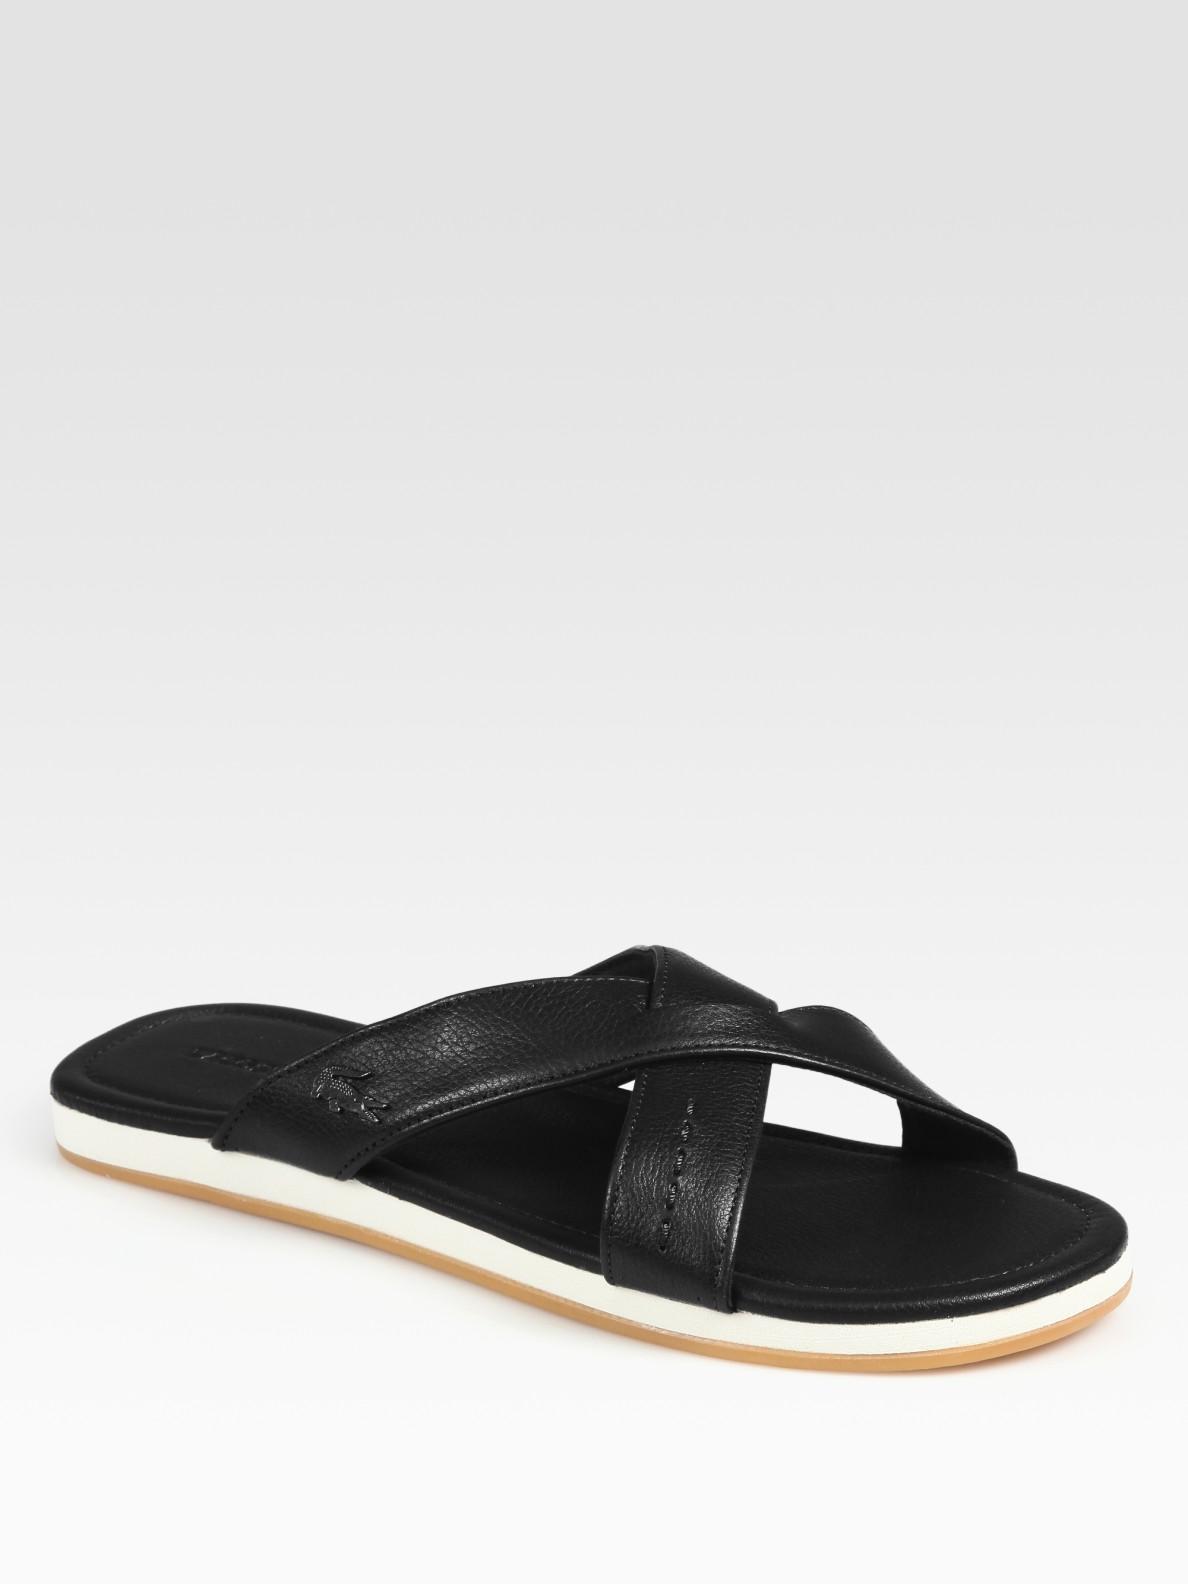 10ee2742c Leather Sandals For Men Lacoste ~ Leather Sandals For Men